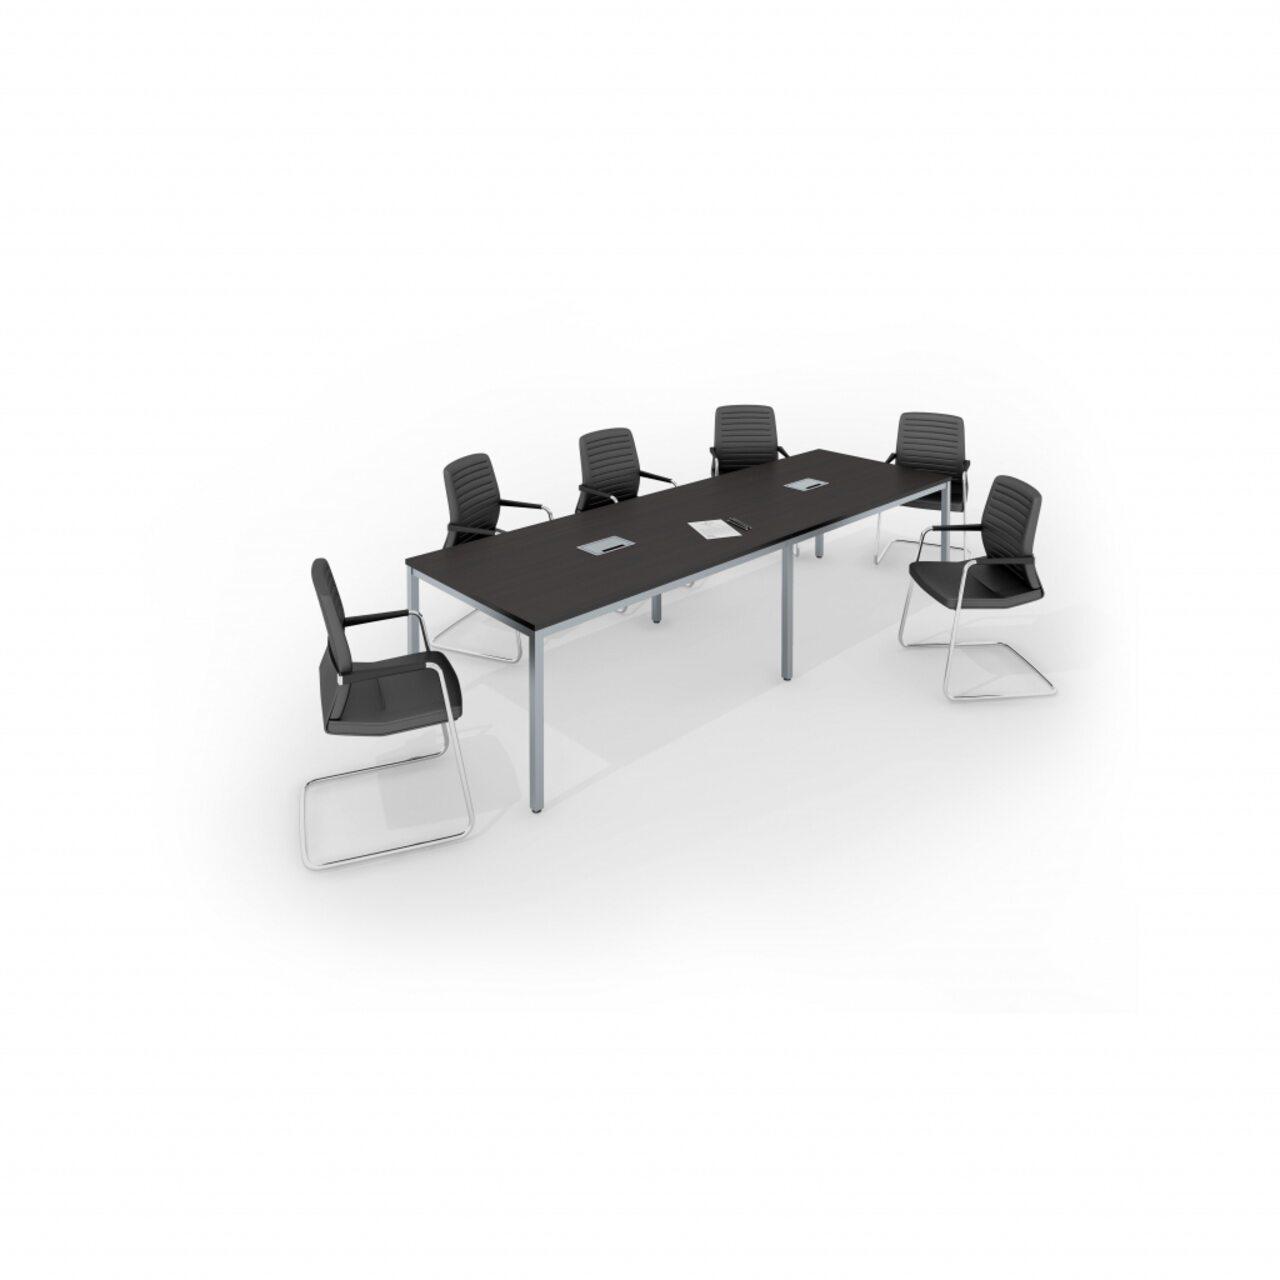 Мебель для персонала Avance - фото 12